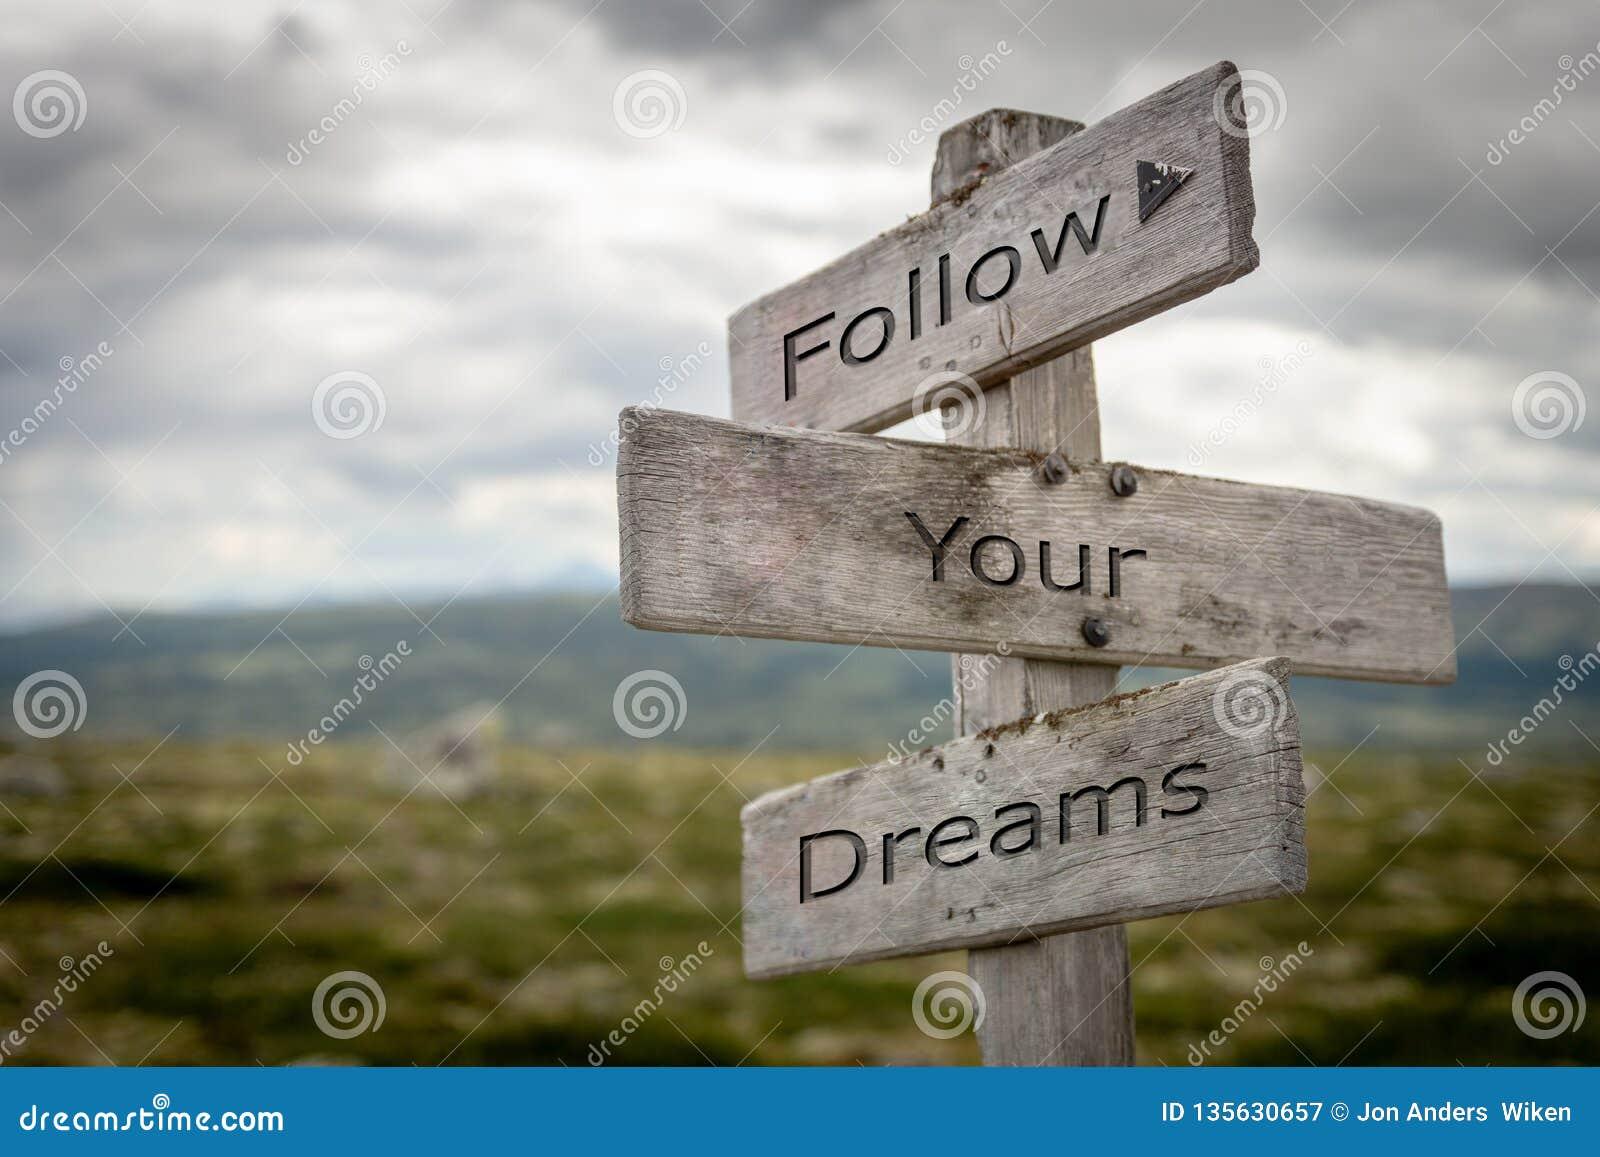 Follow your dreams signpost.